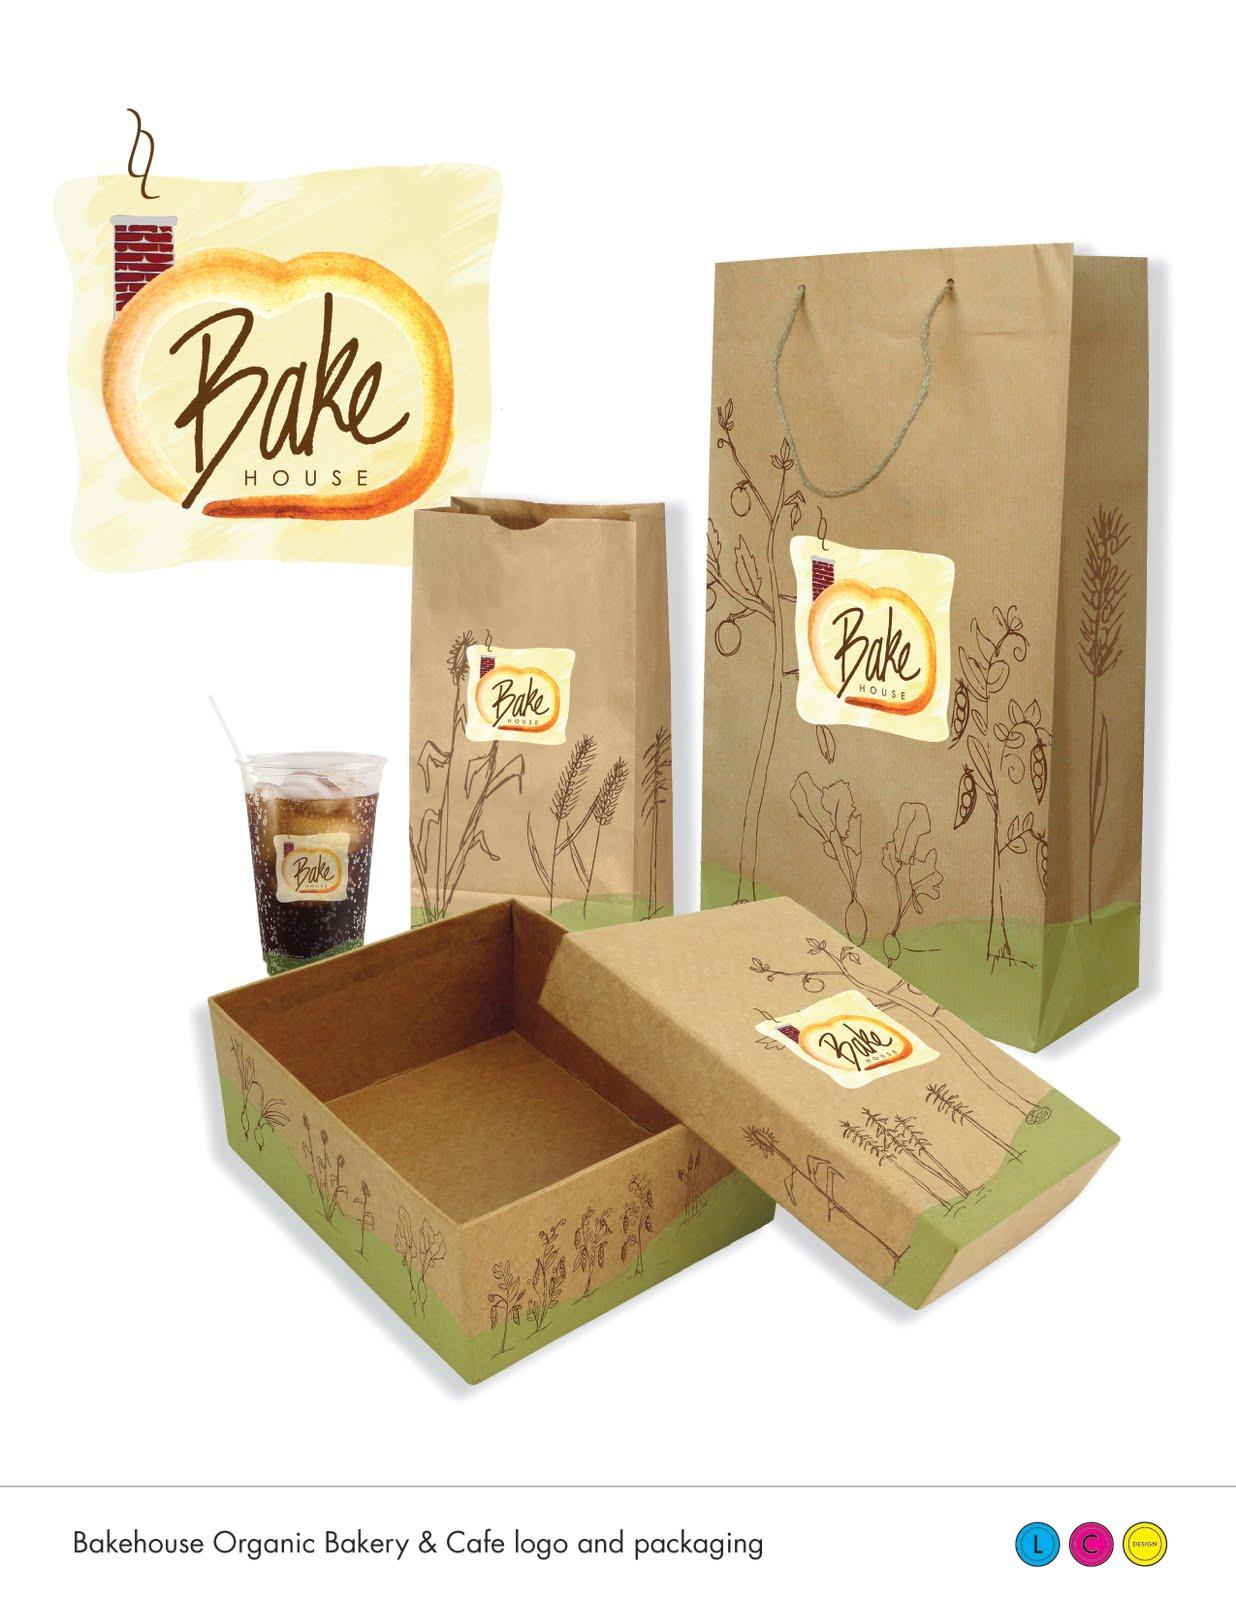 LaCDesign Bakehouse Organic Bakery Cafe